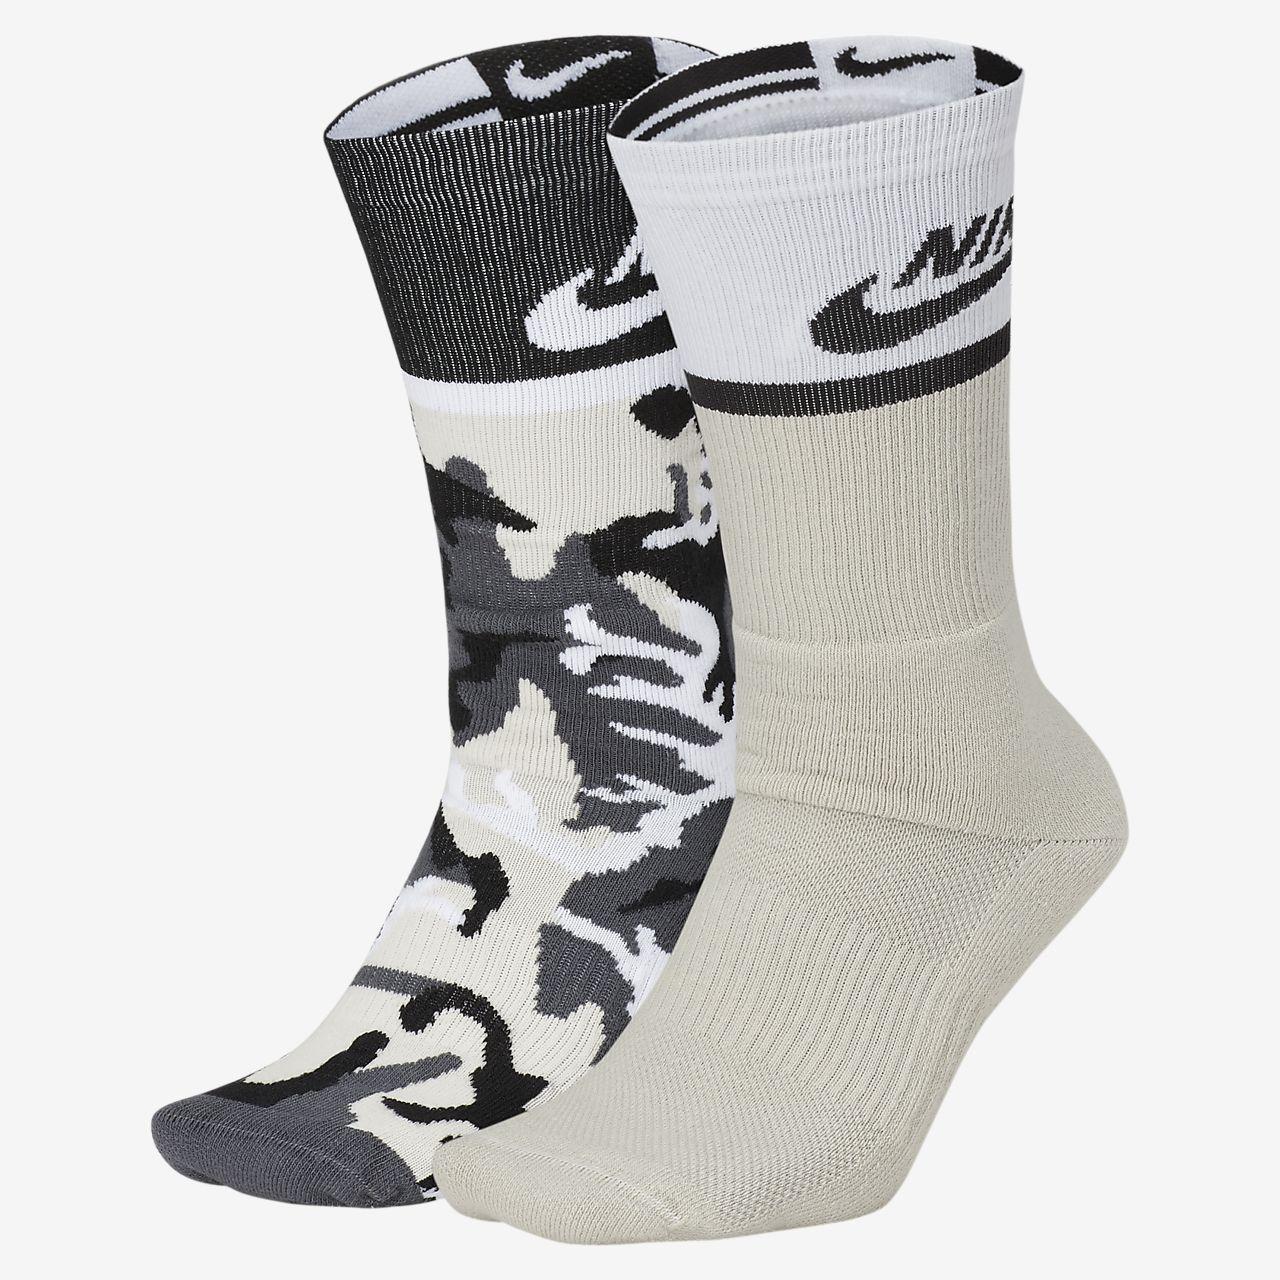 Nike SB Energy Crew 滑板袜(2 双)